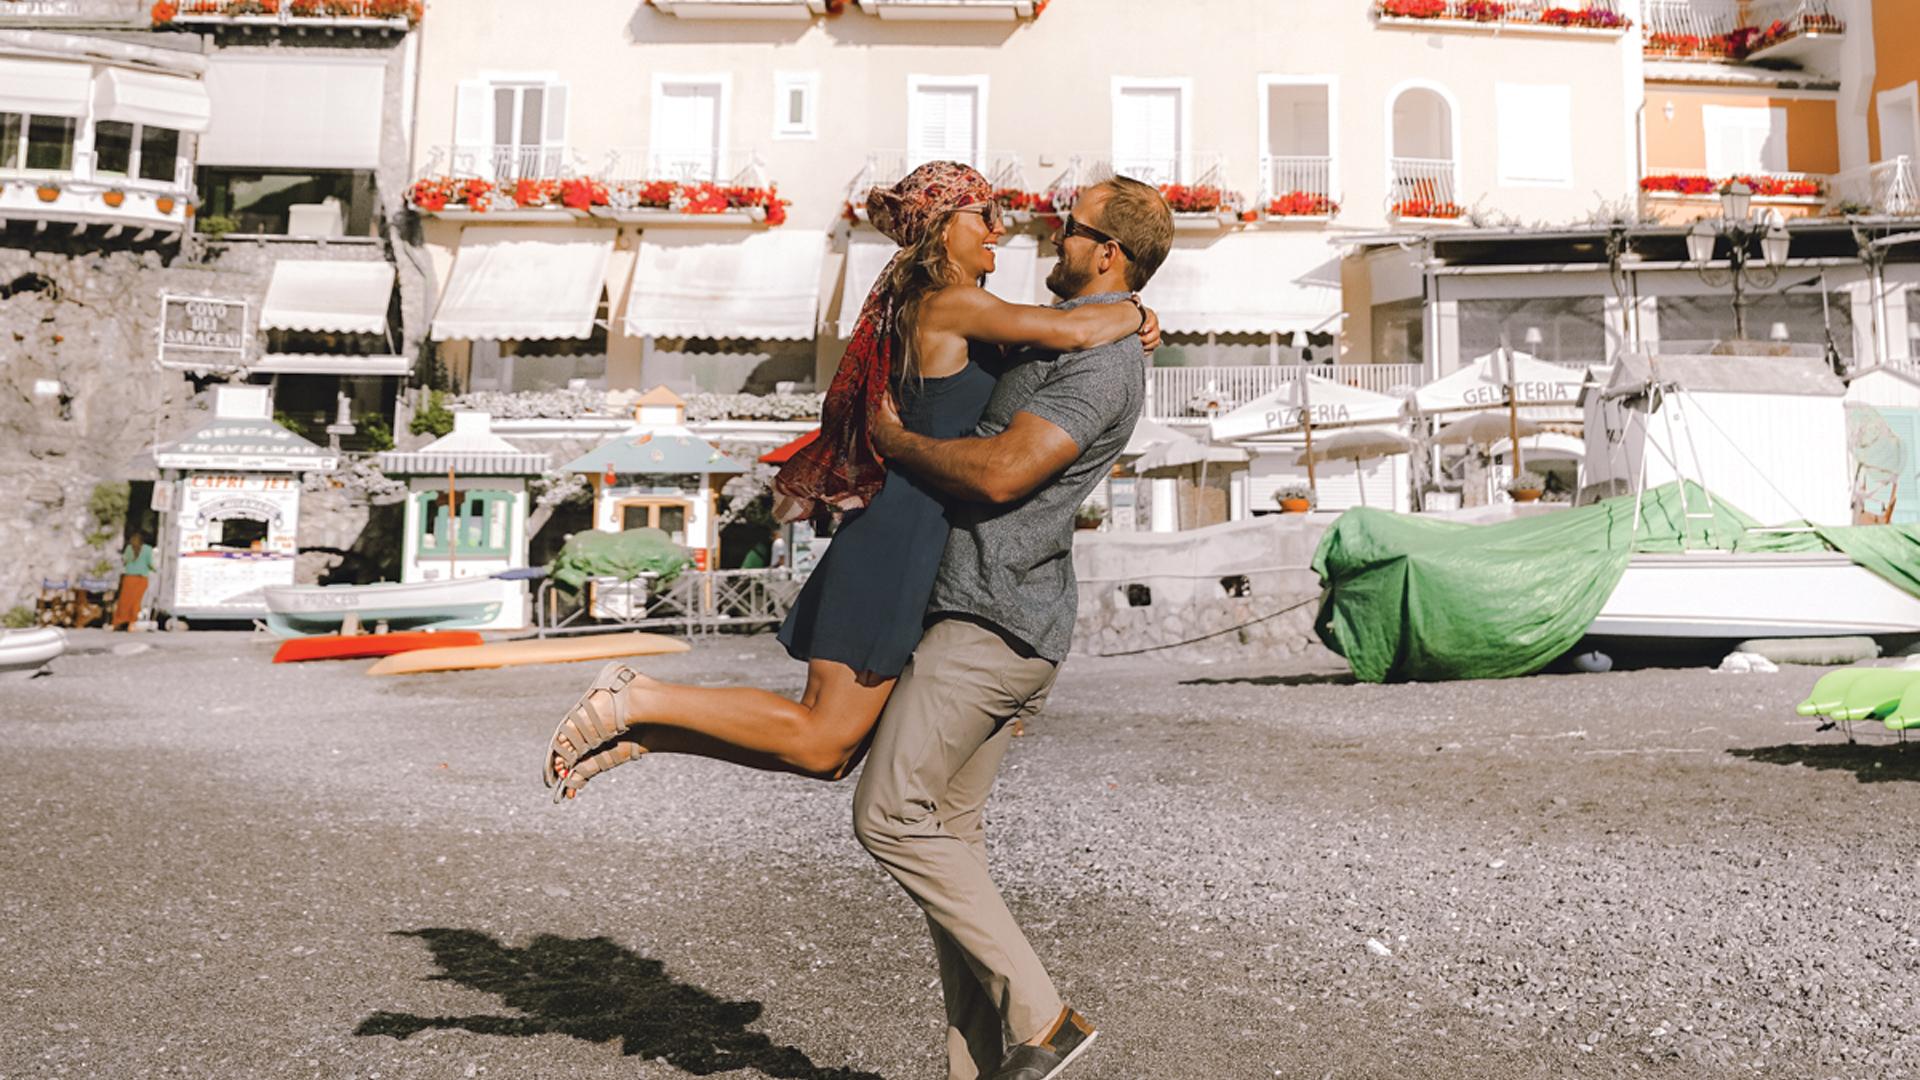 Airstream-Ambassadors-Scott-and-Collette-Dancing